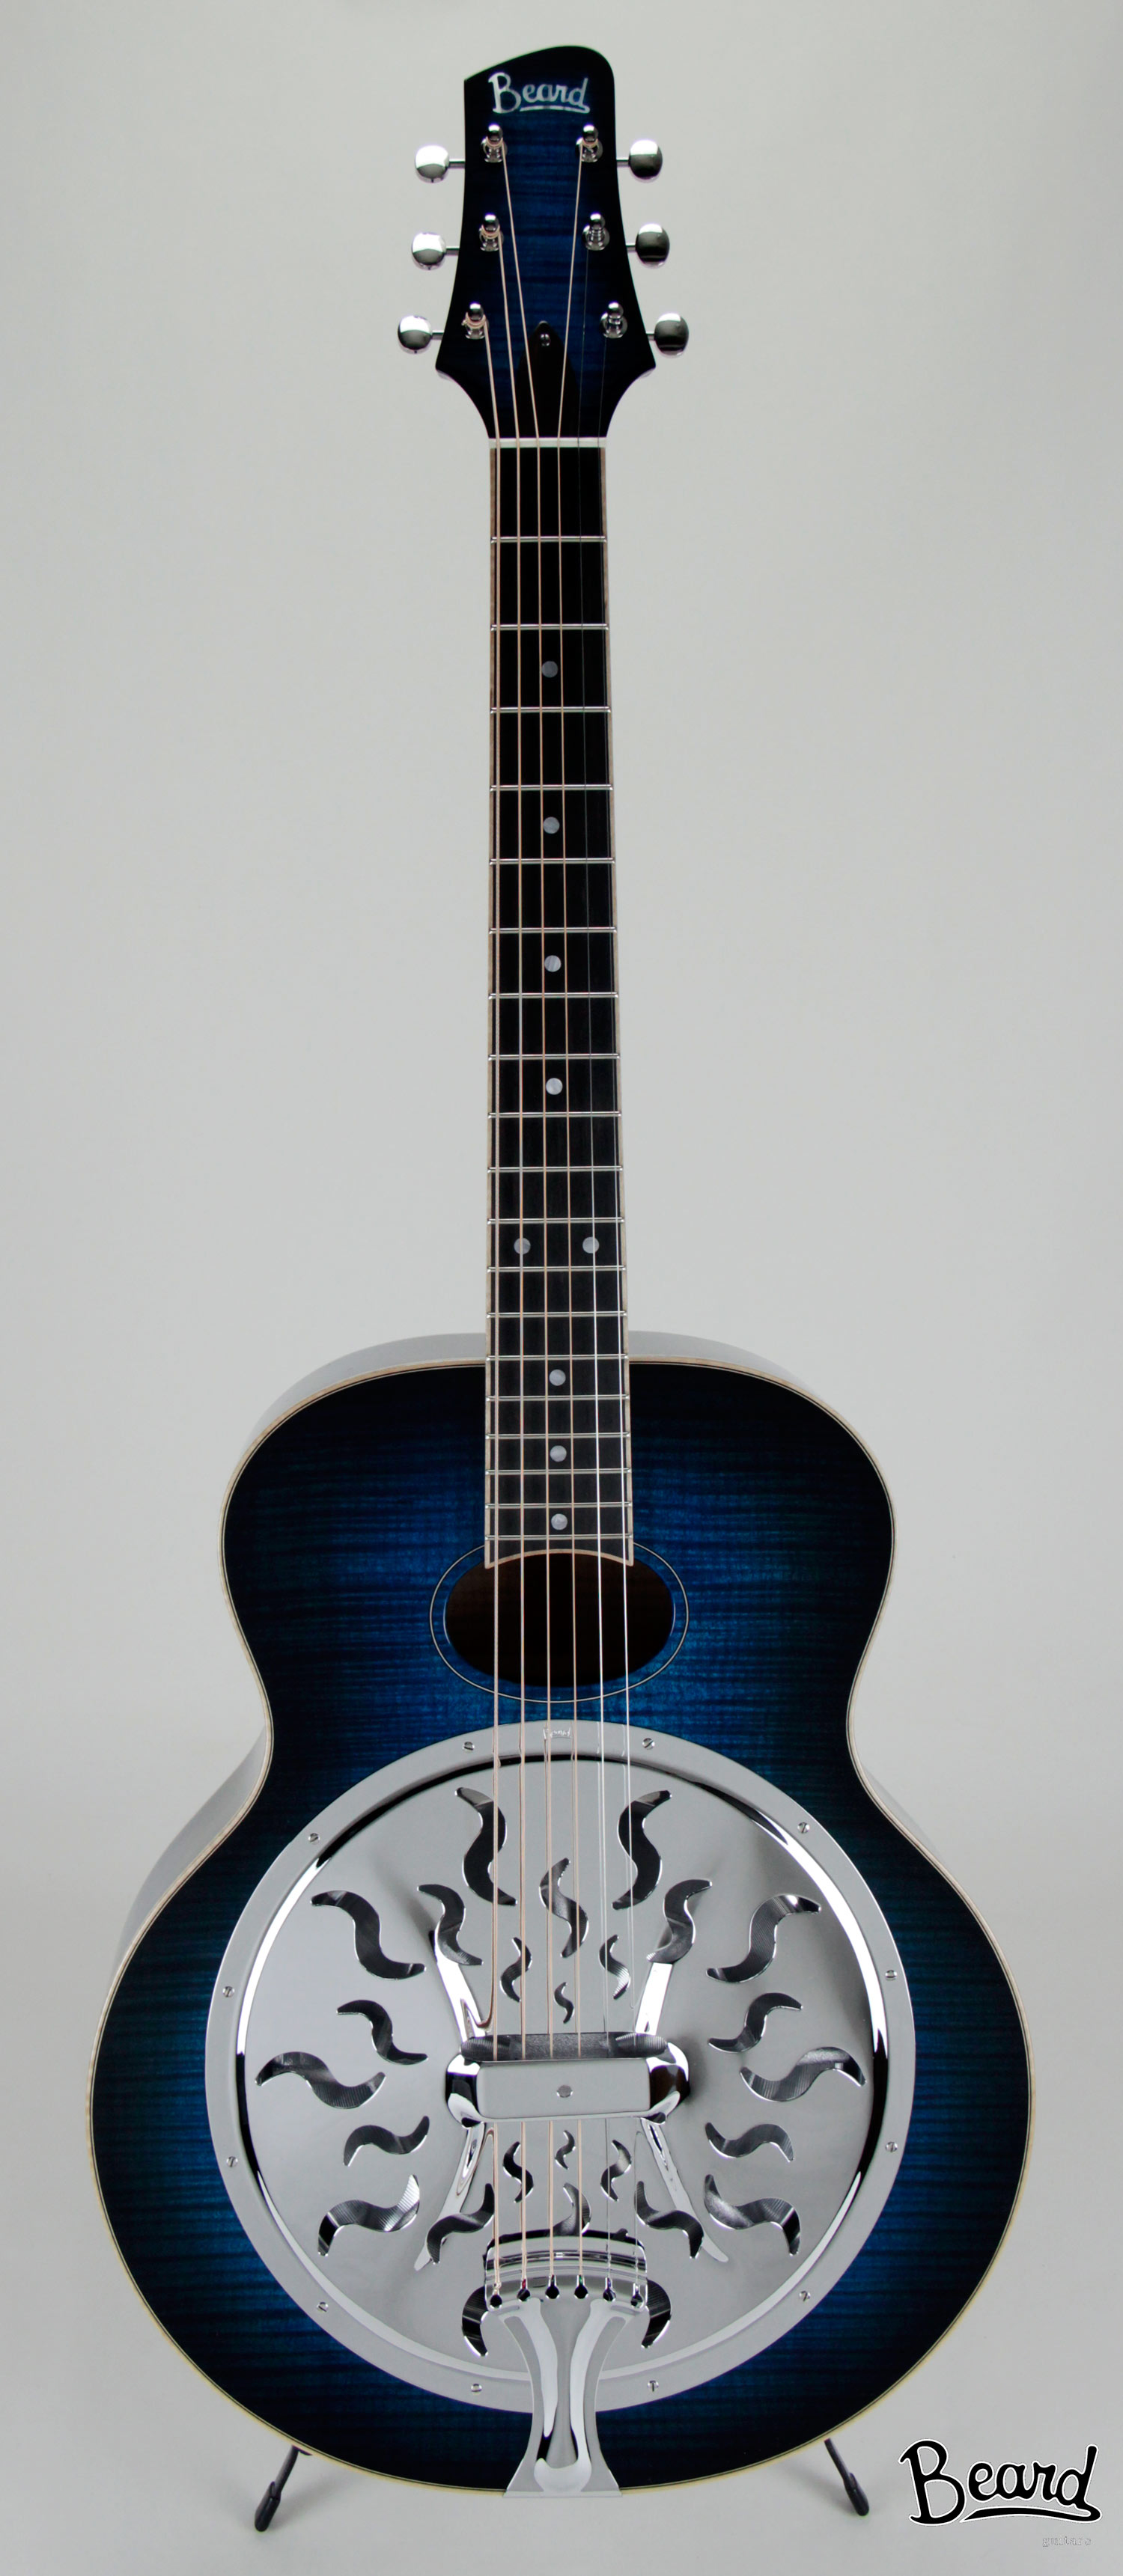 A Model Maple Midnight Blueburst